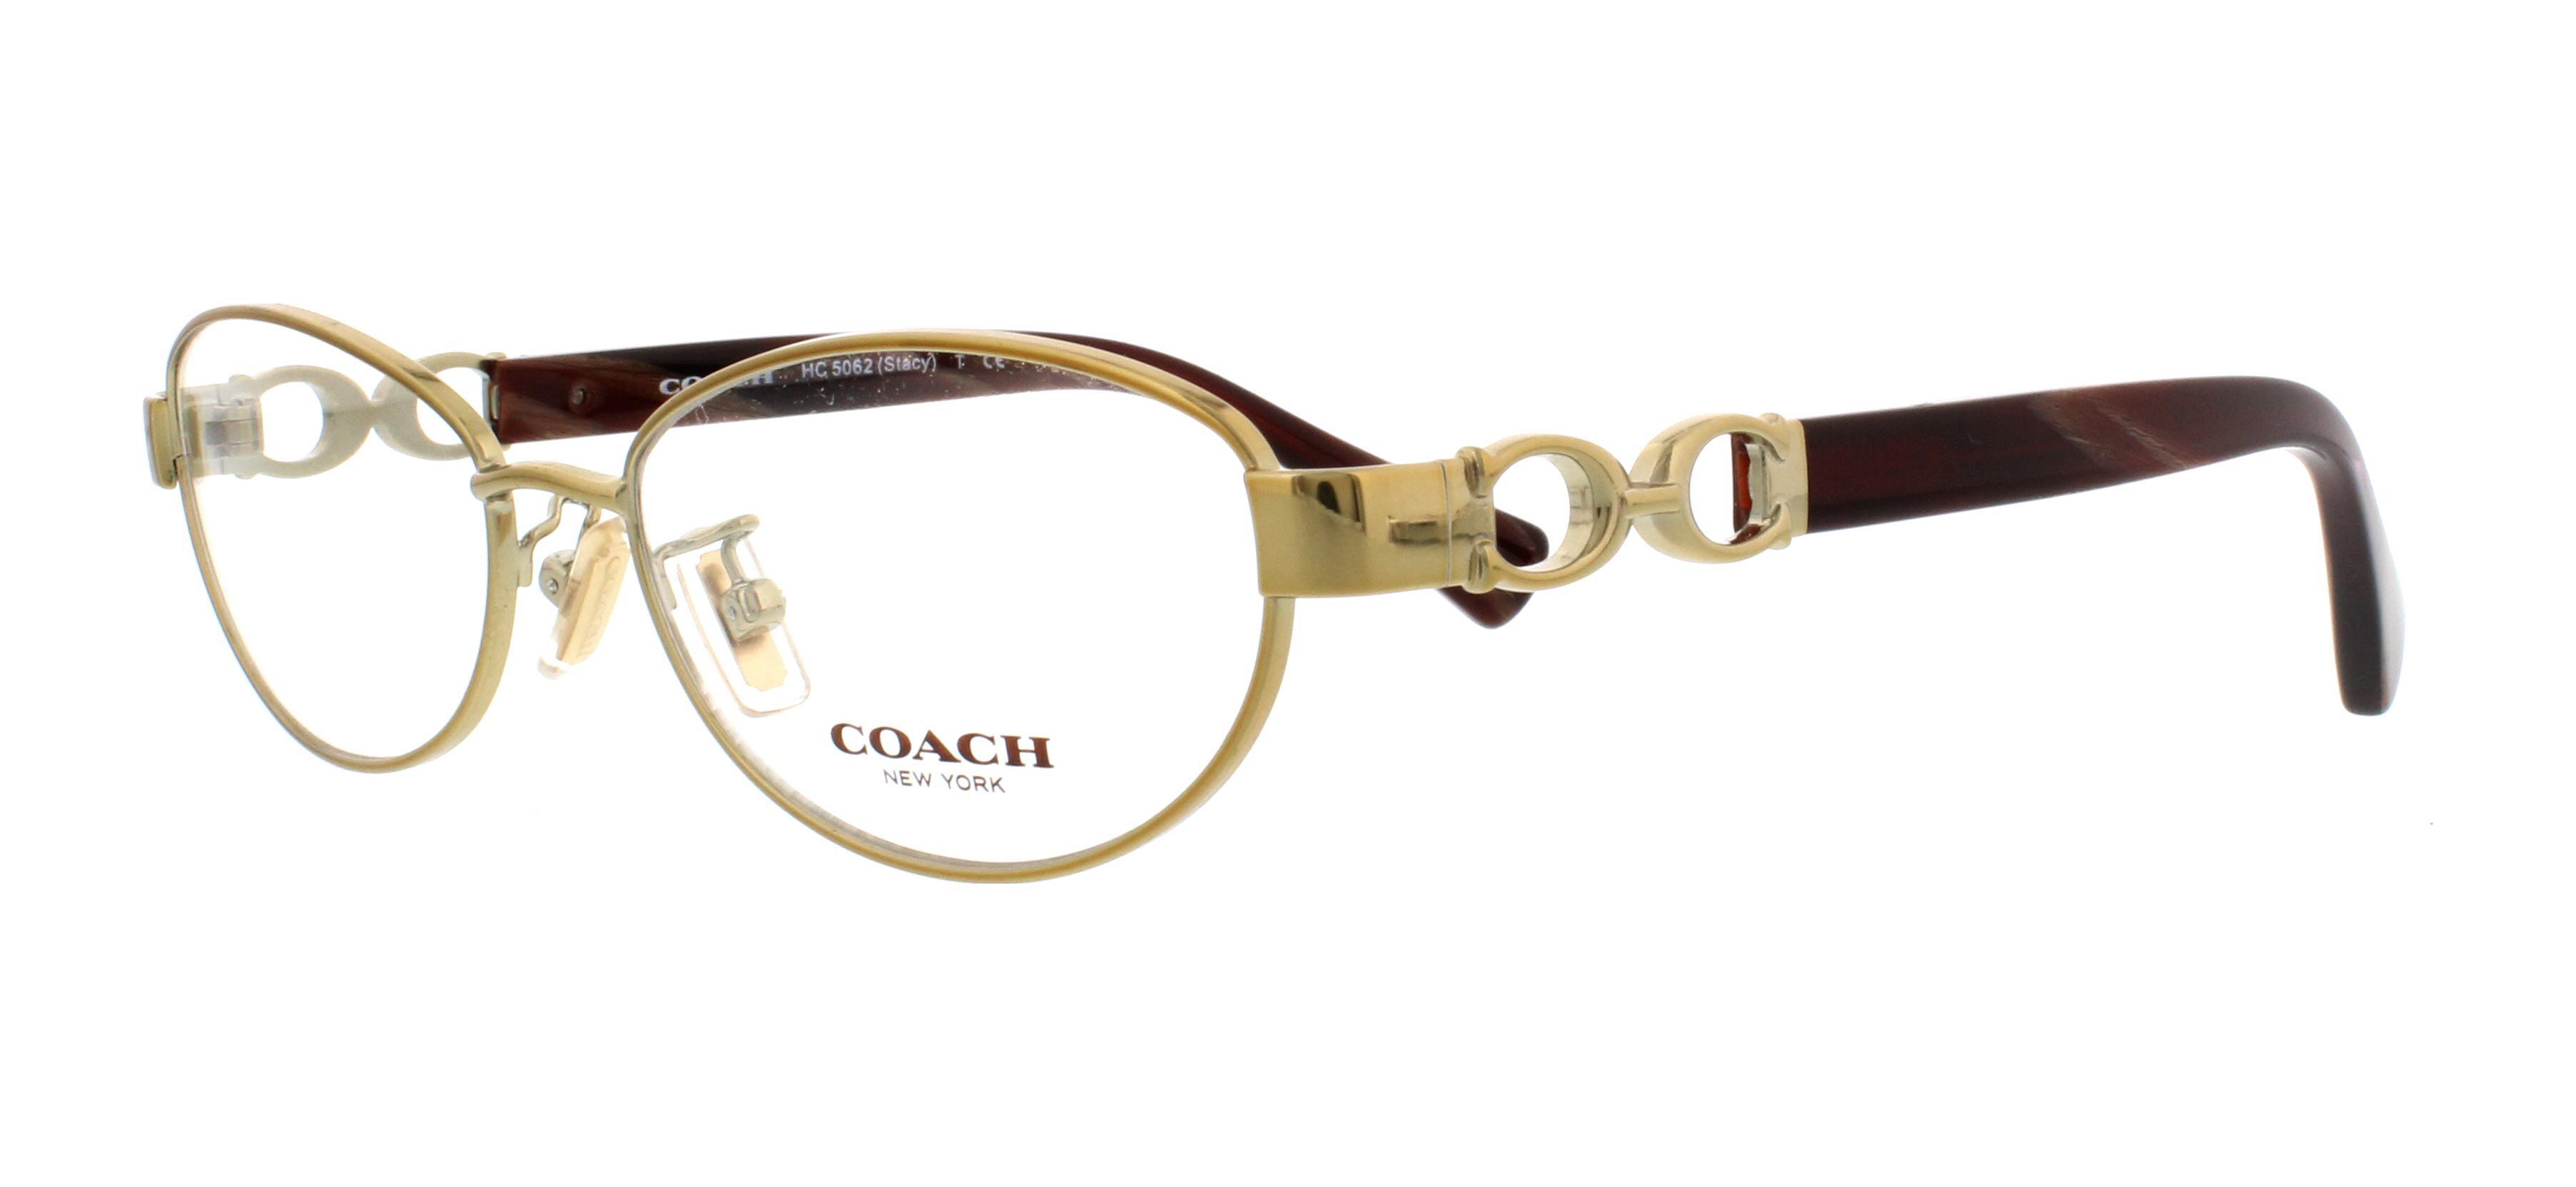 9205 Gold Burgundy Horn